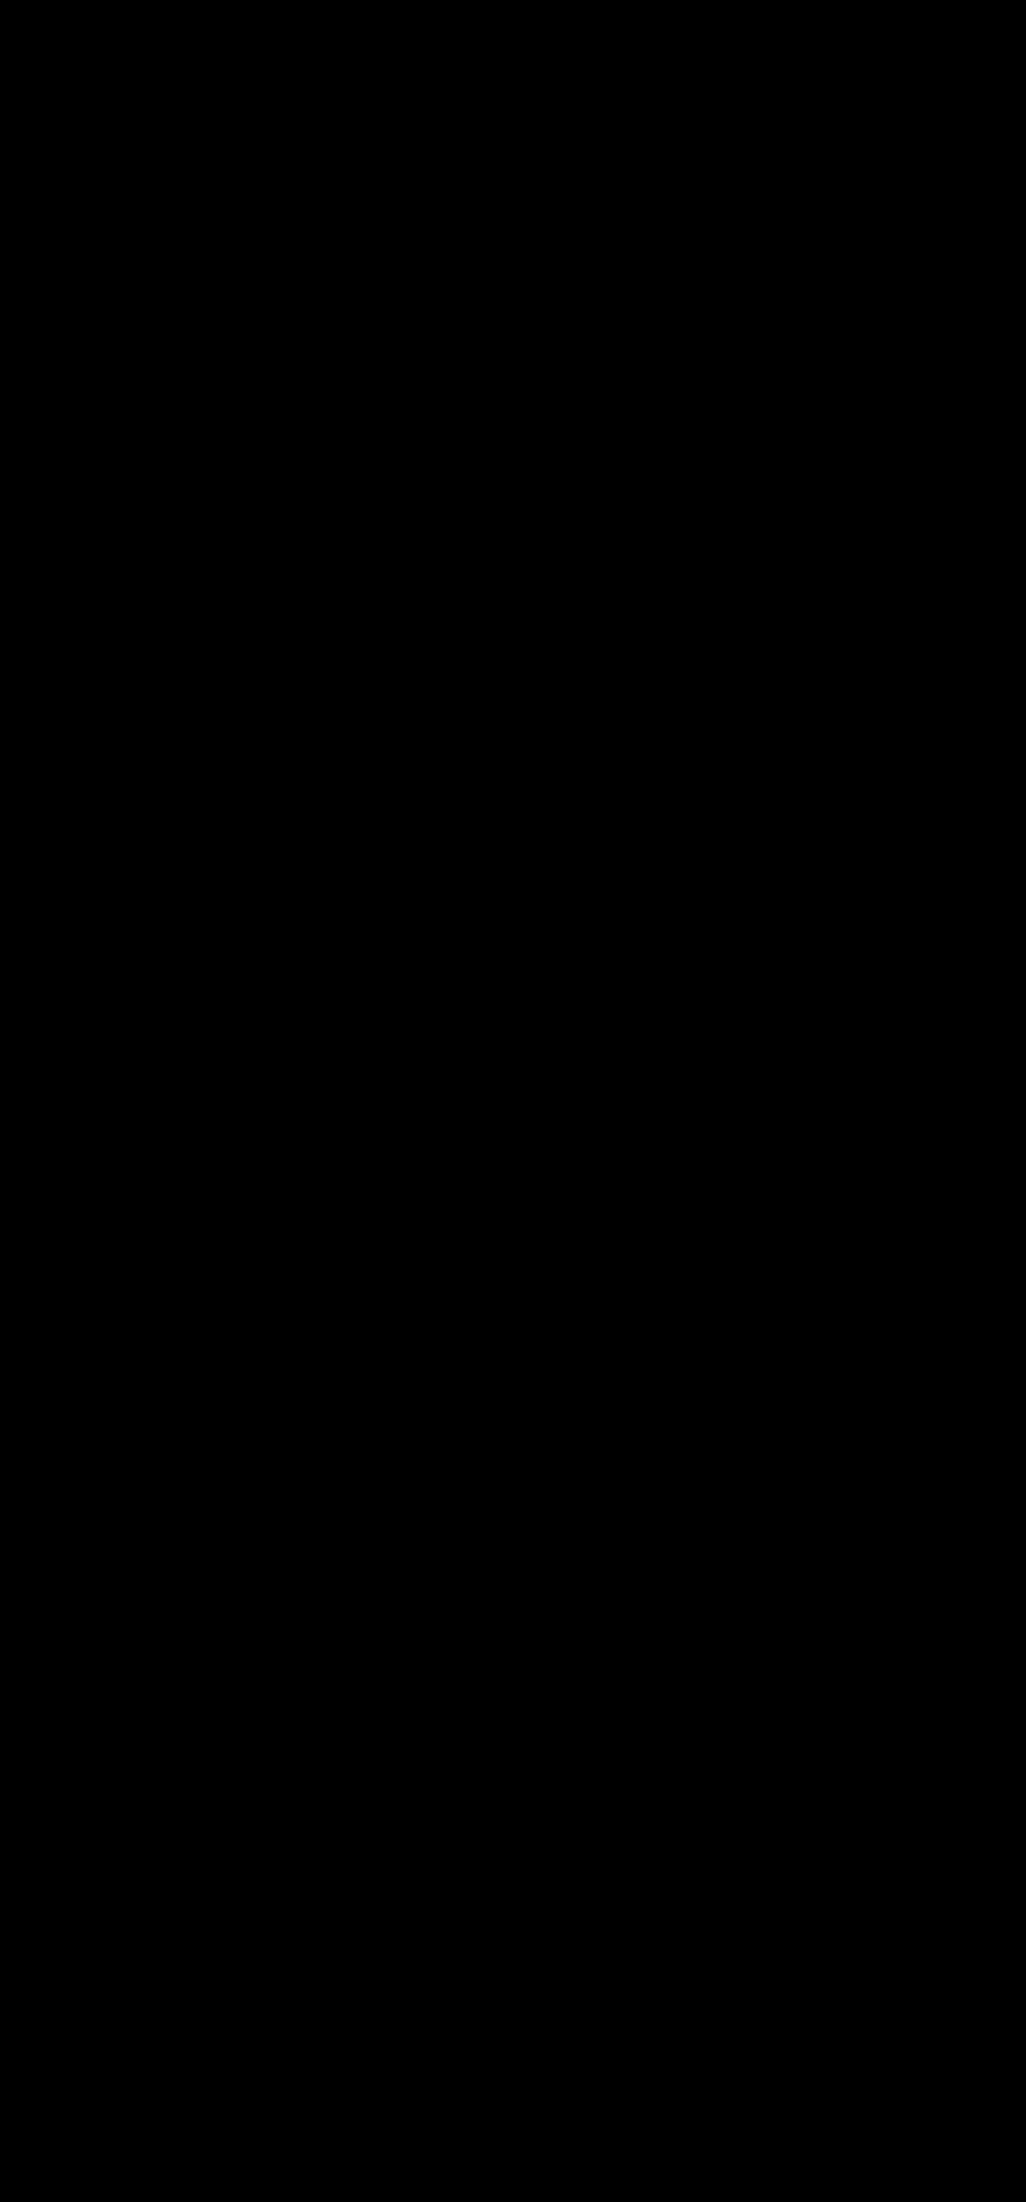 1026x2202 Clipart